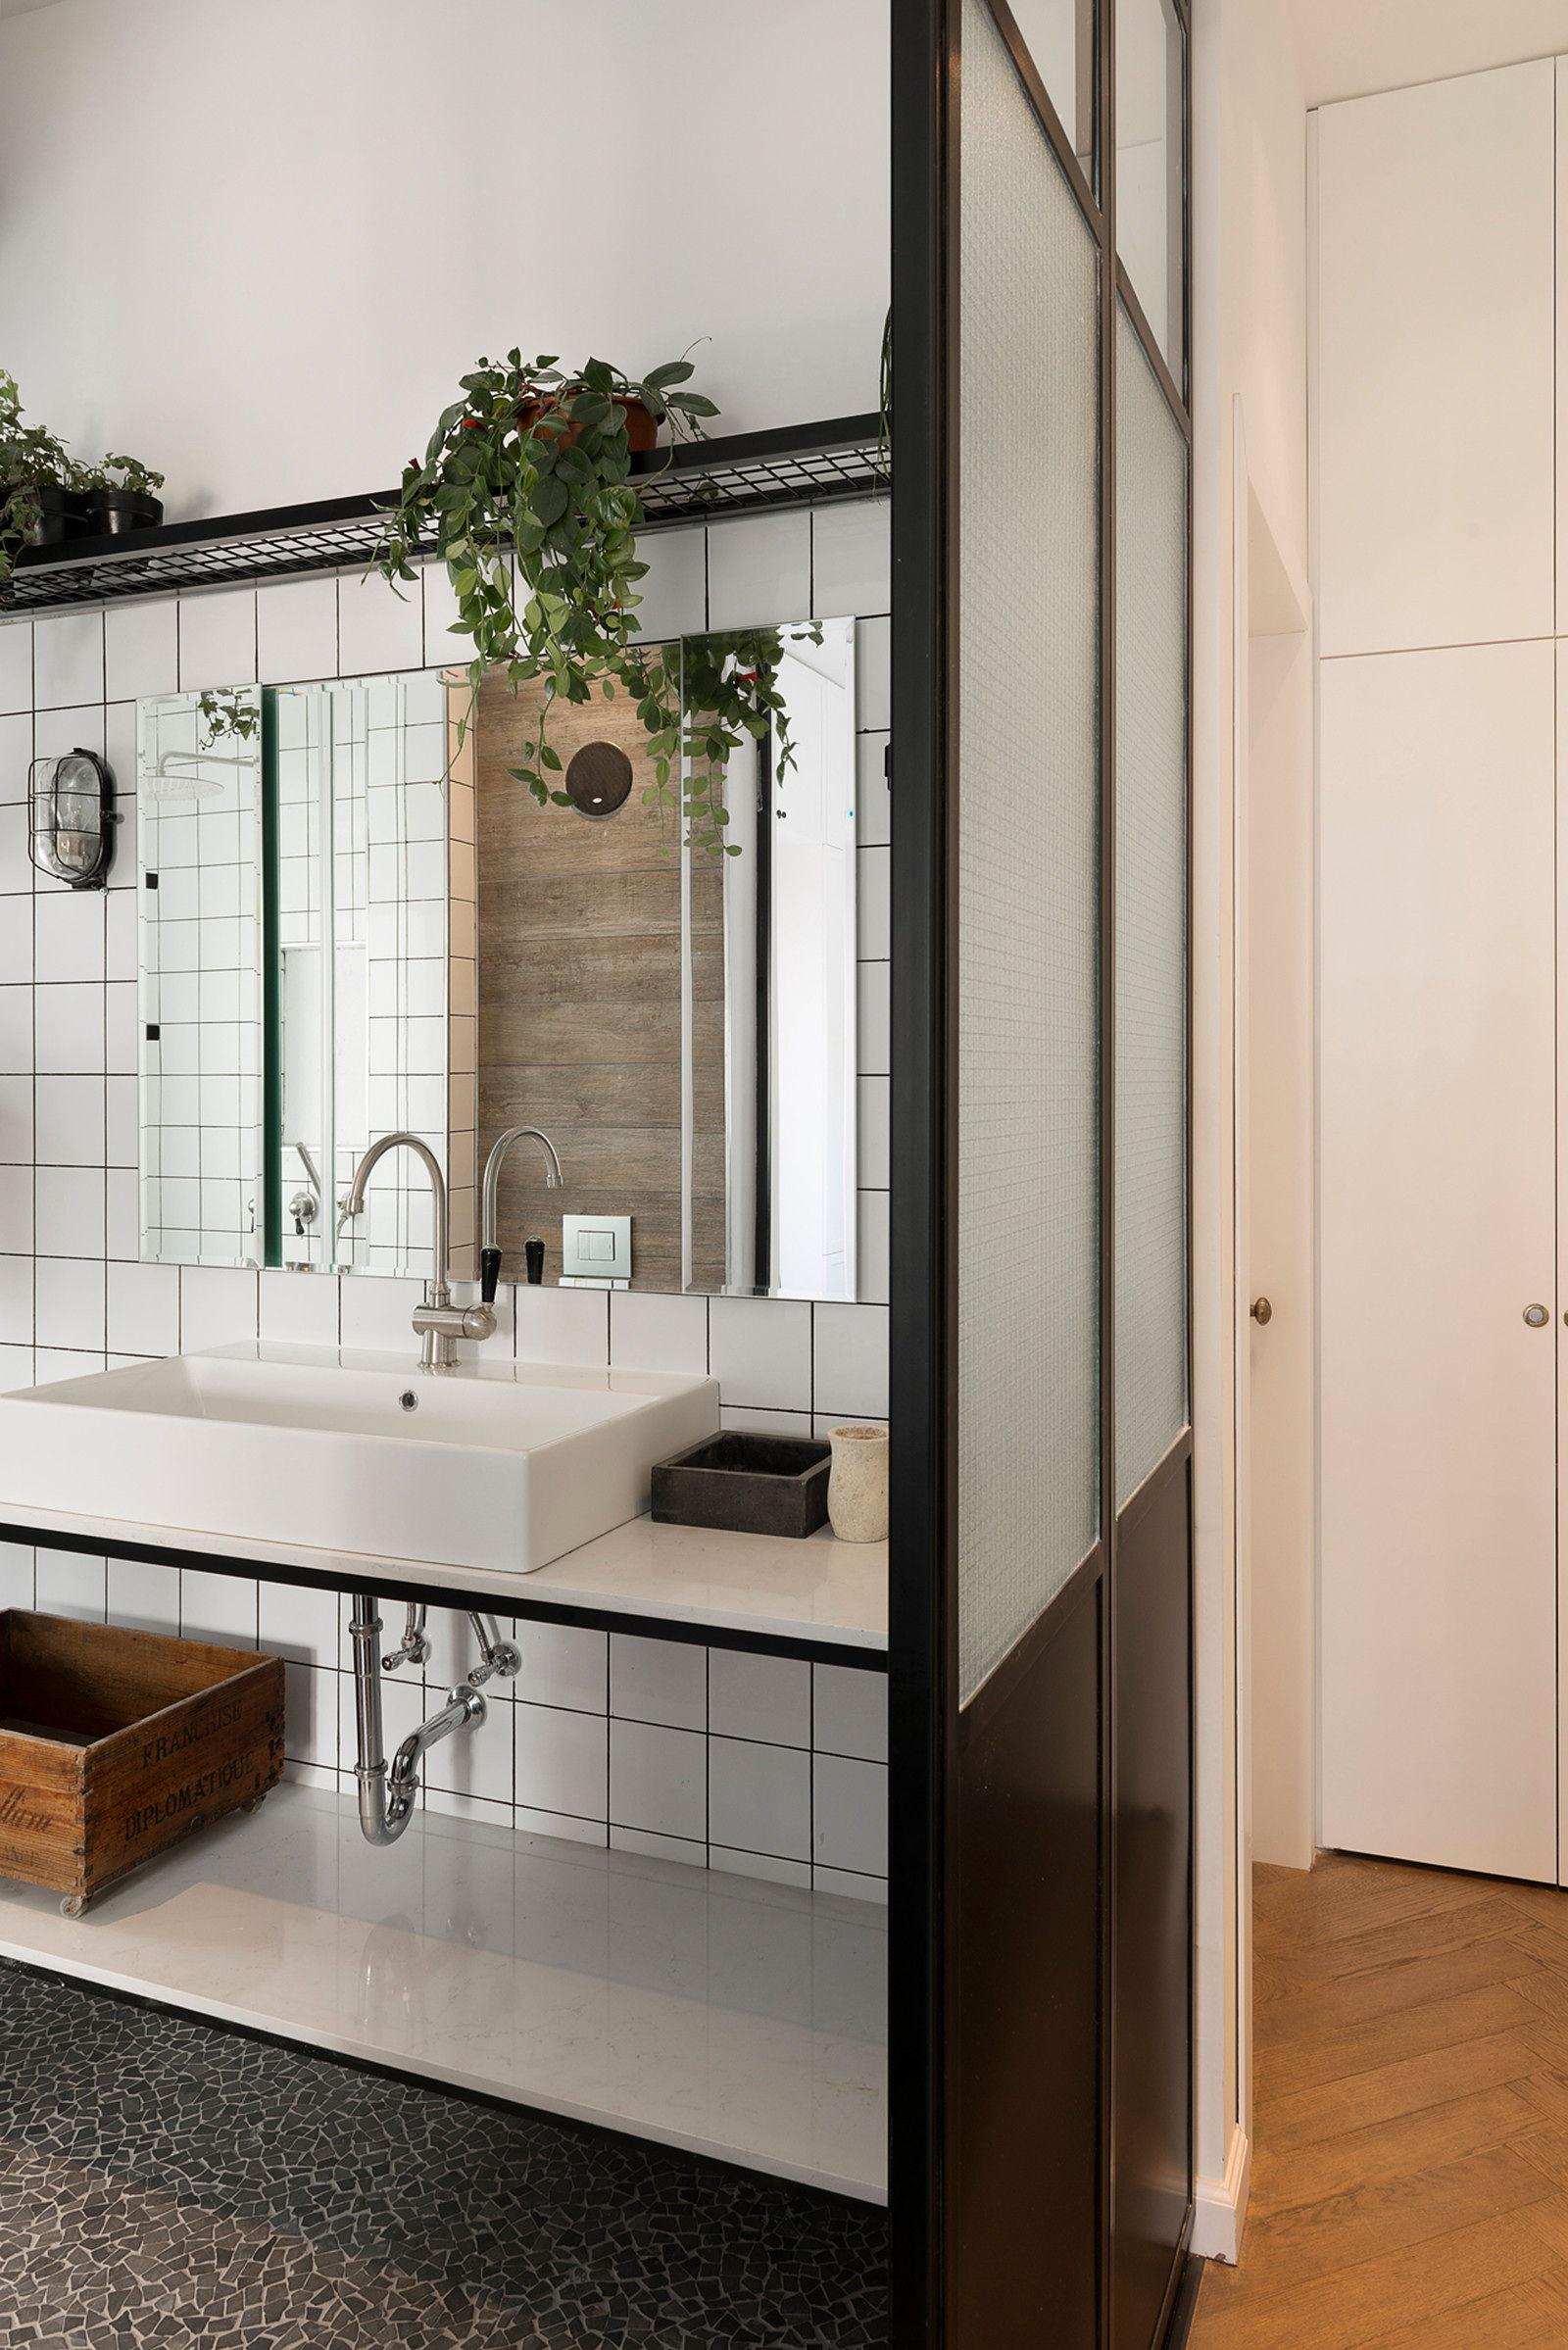 Renovation-Of-The-Apartment-In-Israel-From-Raanans-Sterns-Studio-19.jpg